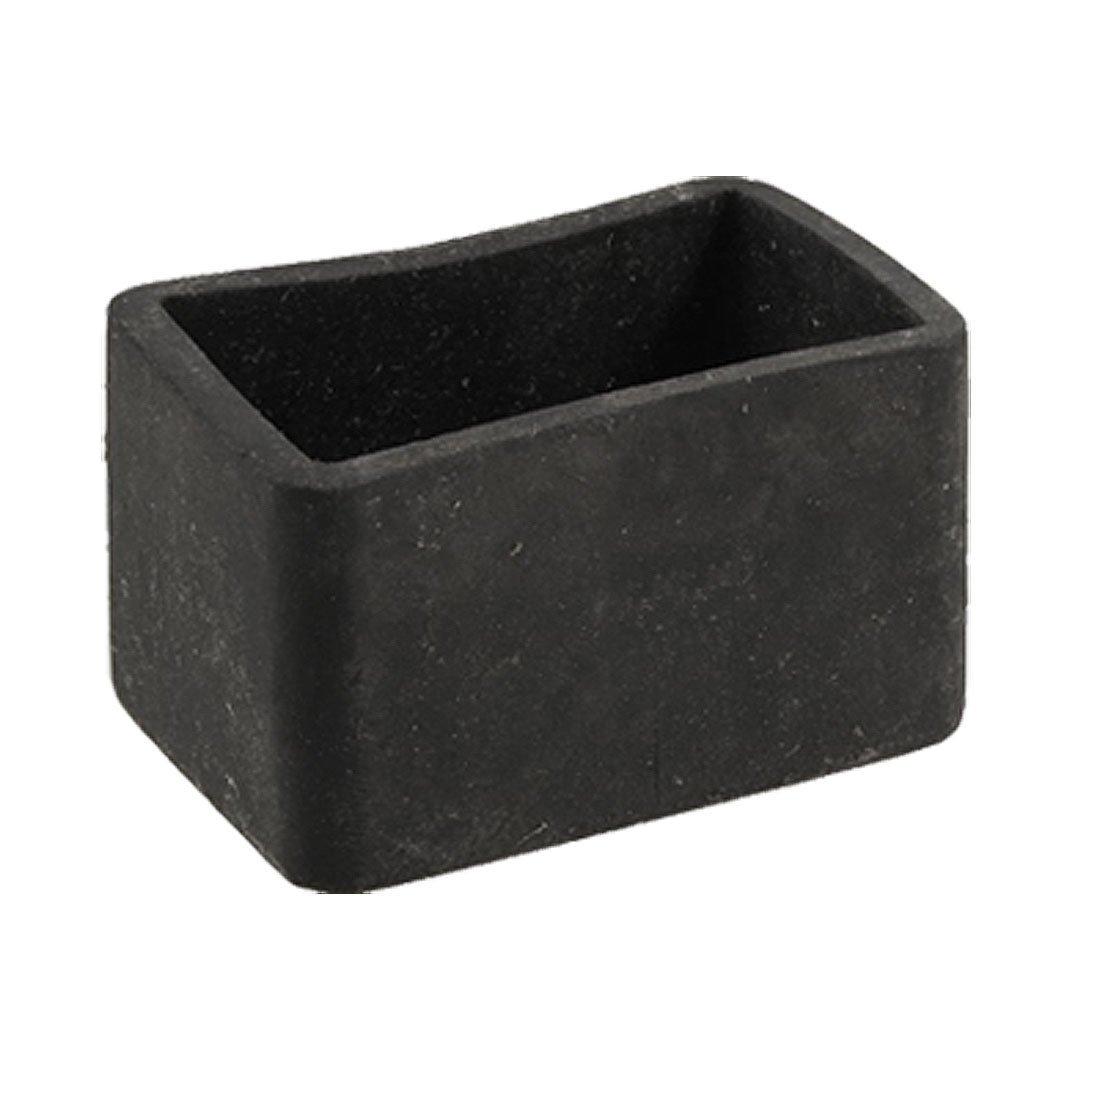 Table Chair Leg Black Rubber Rectangle 25mm X 38mm